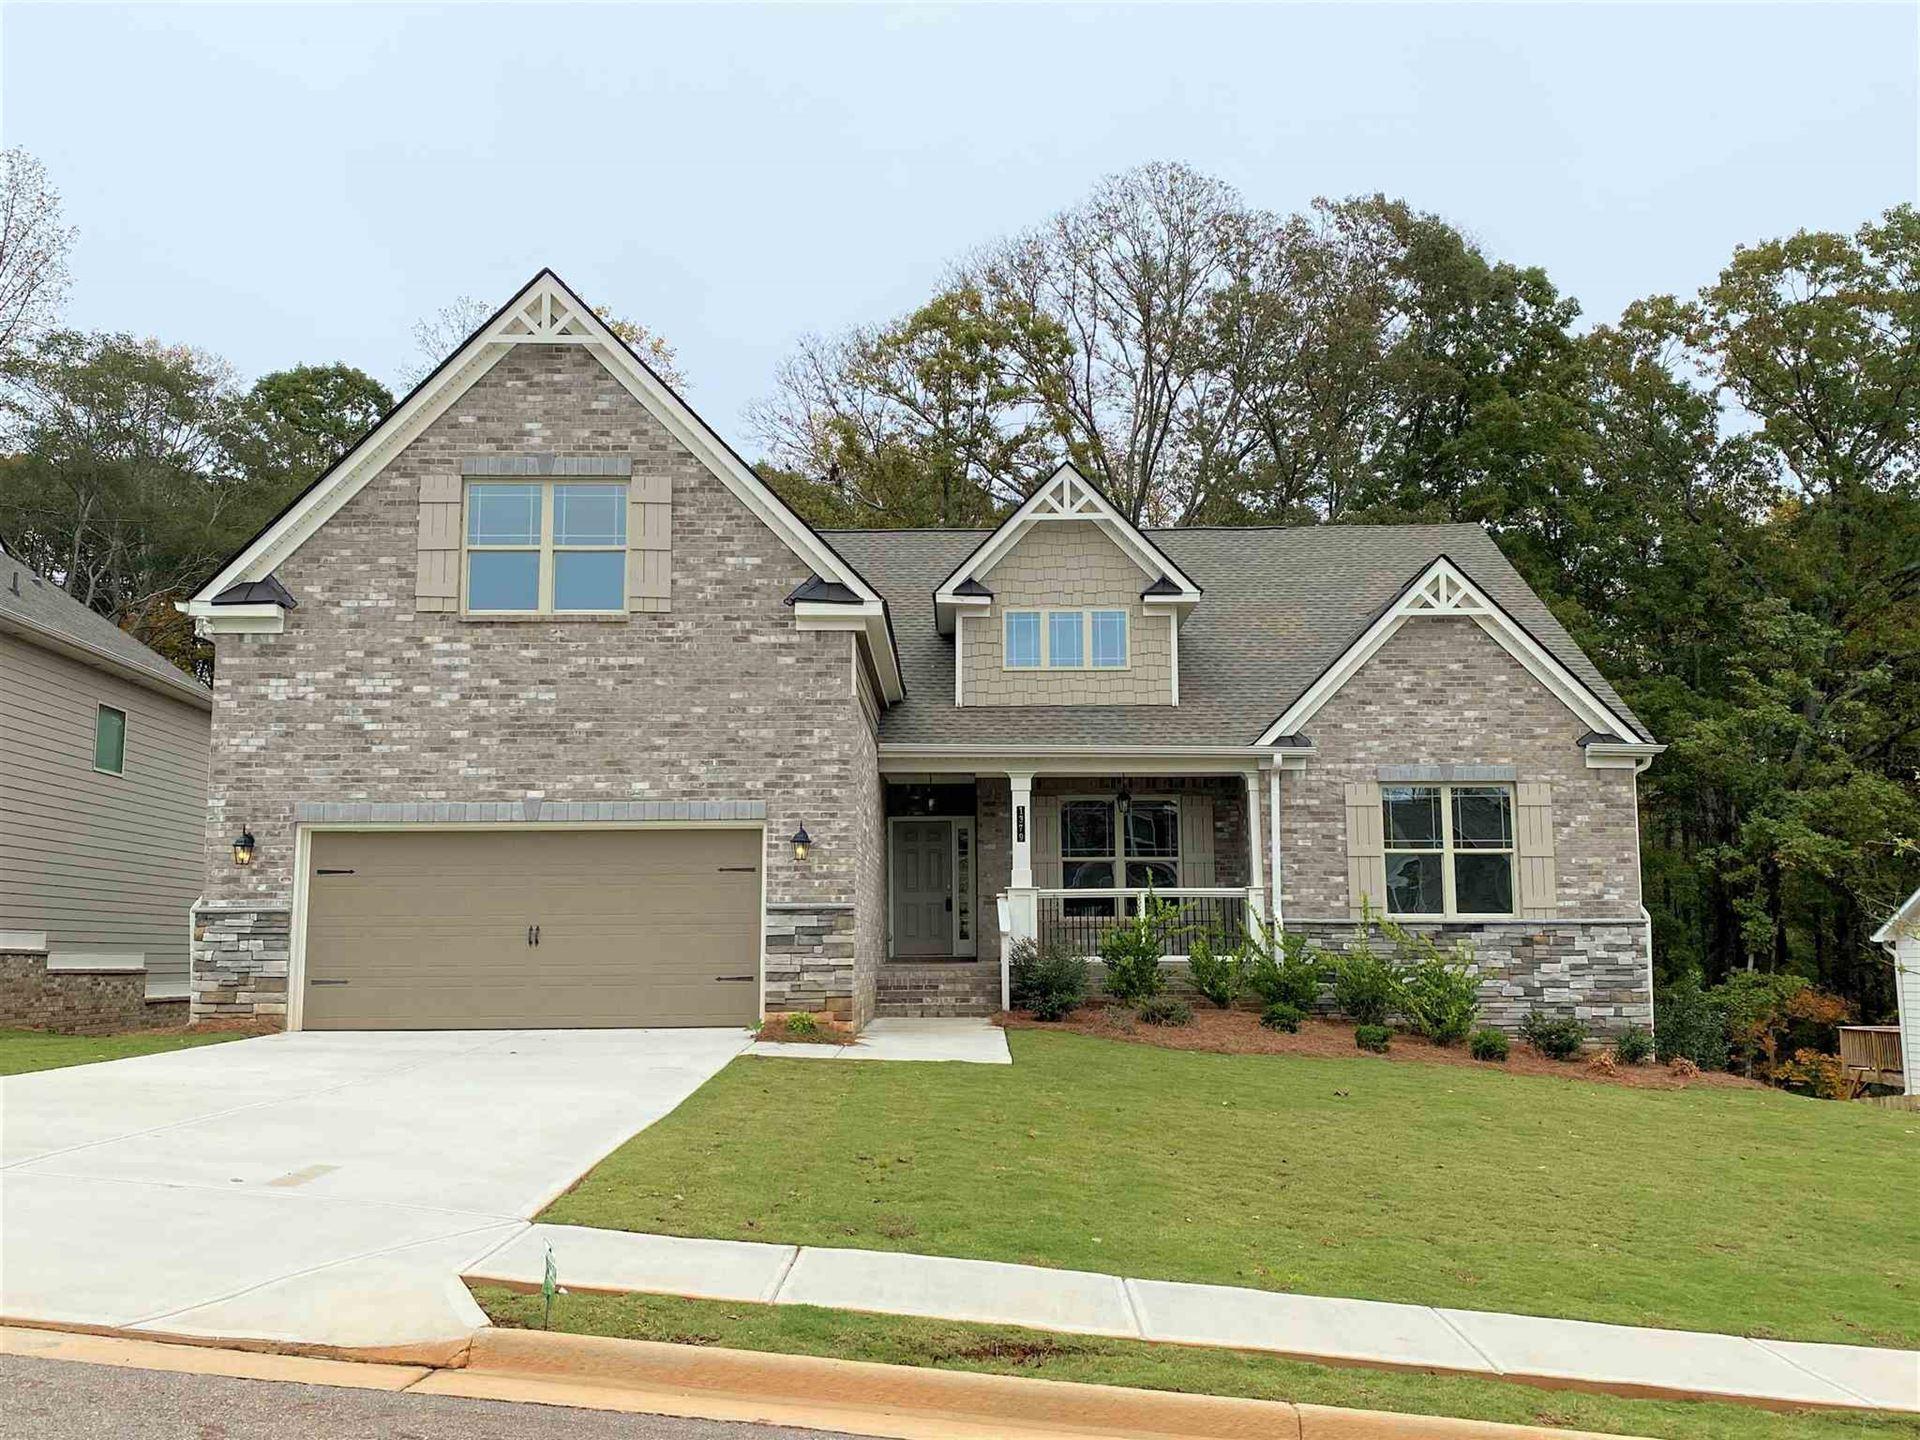 1379 Pond Overlook Dr, Auburn, GA 30011 - #: 8880879